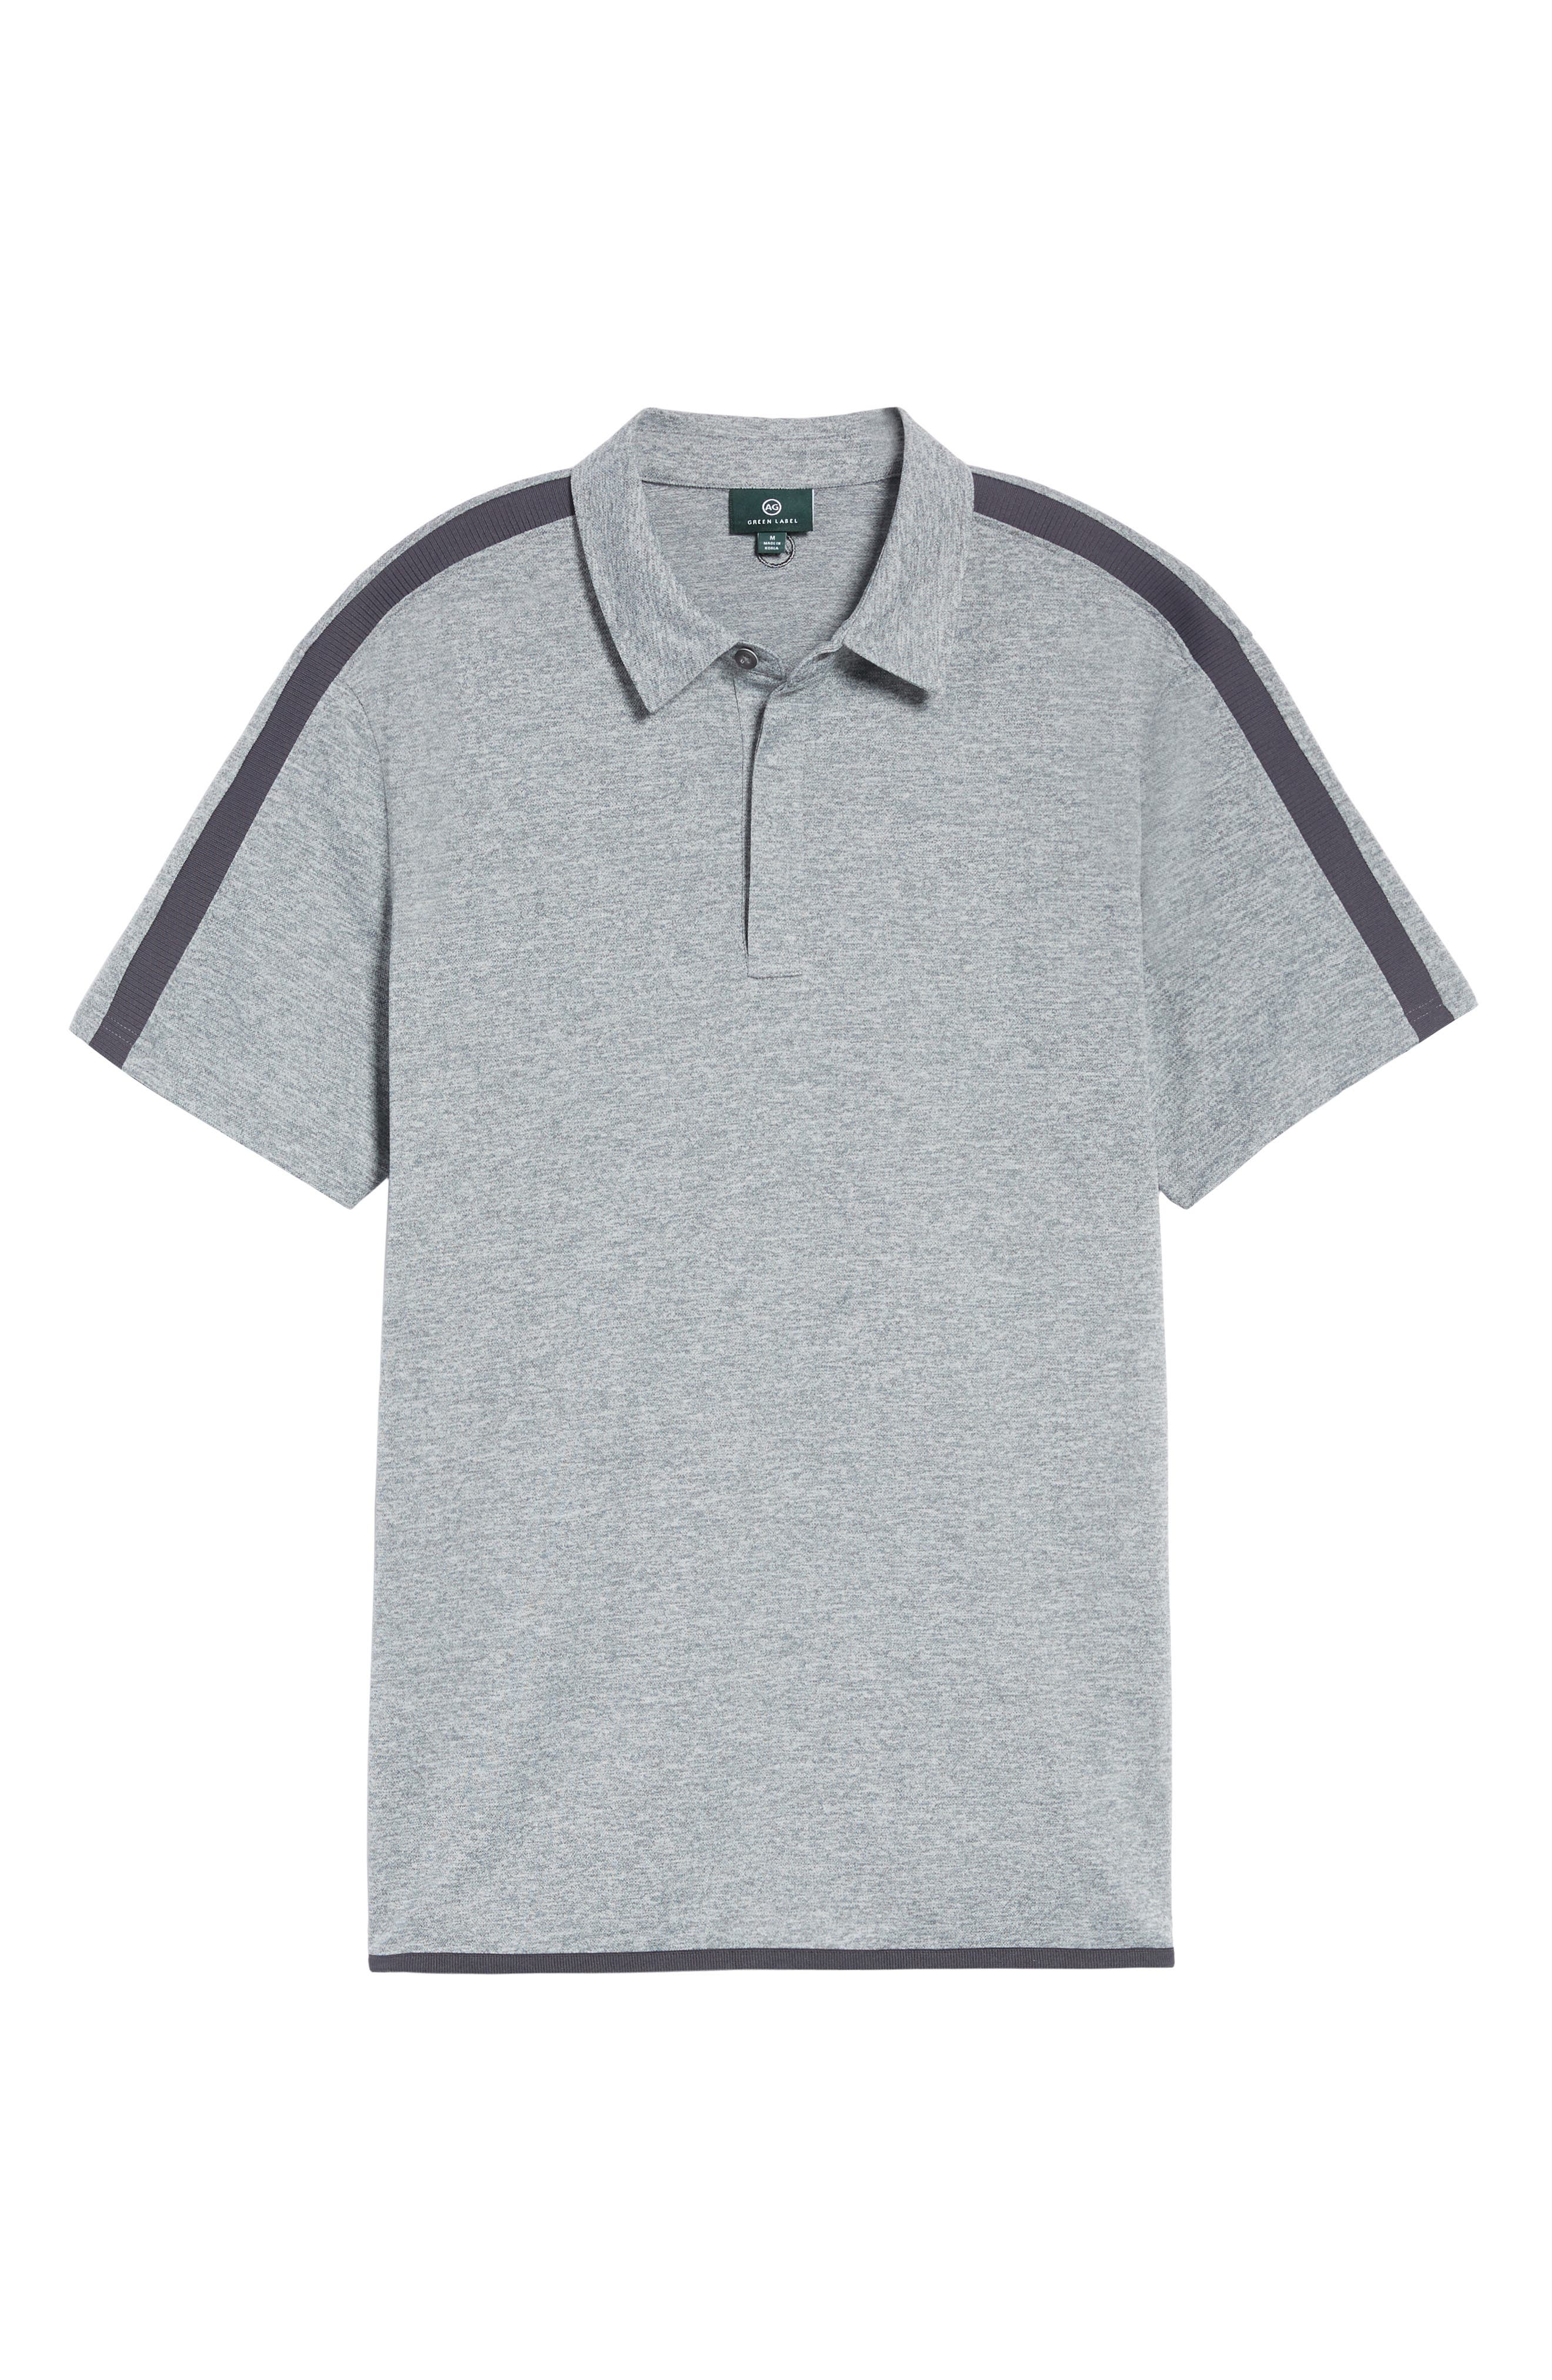 Felton Shoulder Stripe Polo,                             Alternate thumbnail 6, color,                             9-Iron Grey Melange